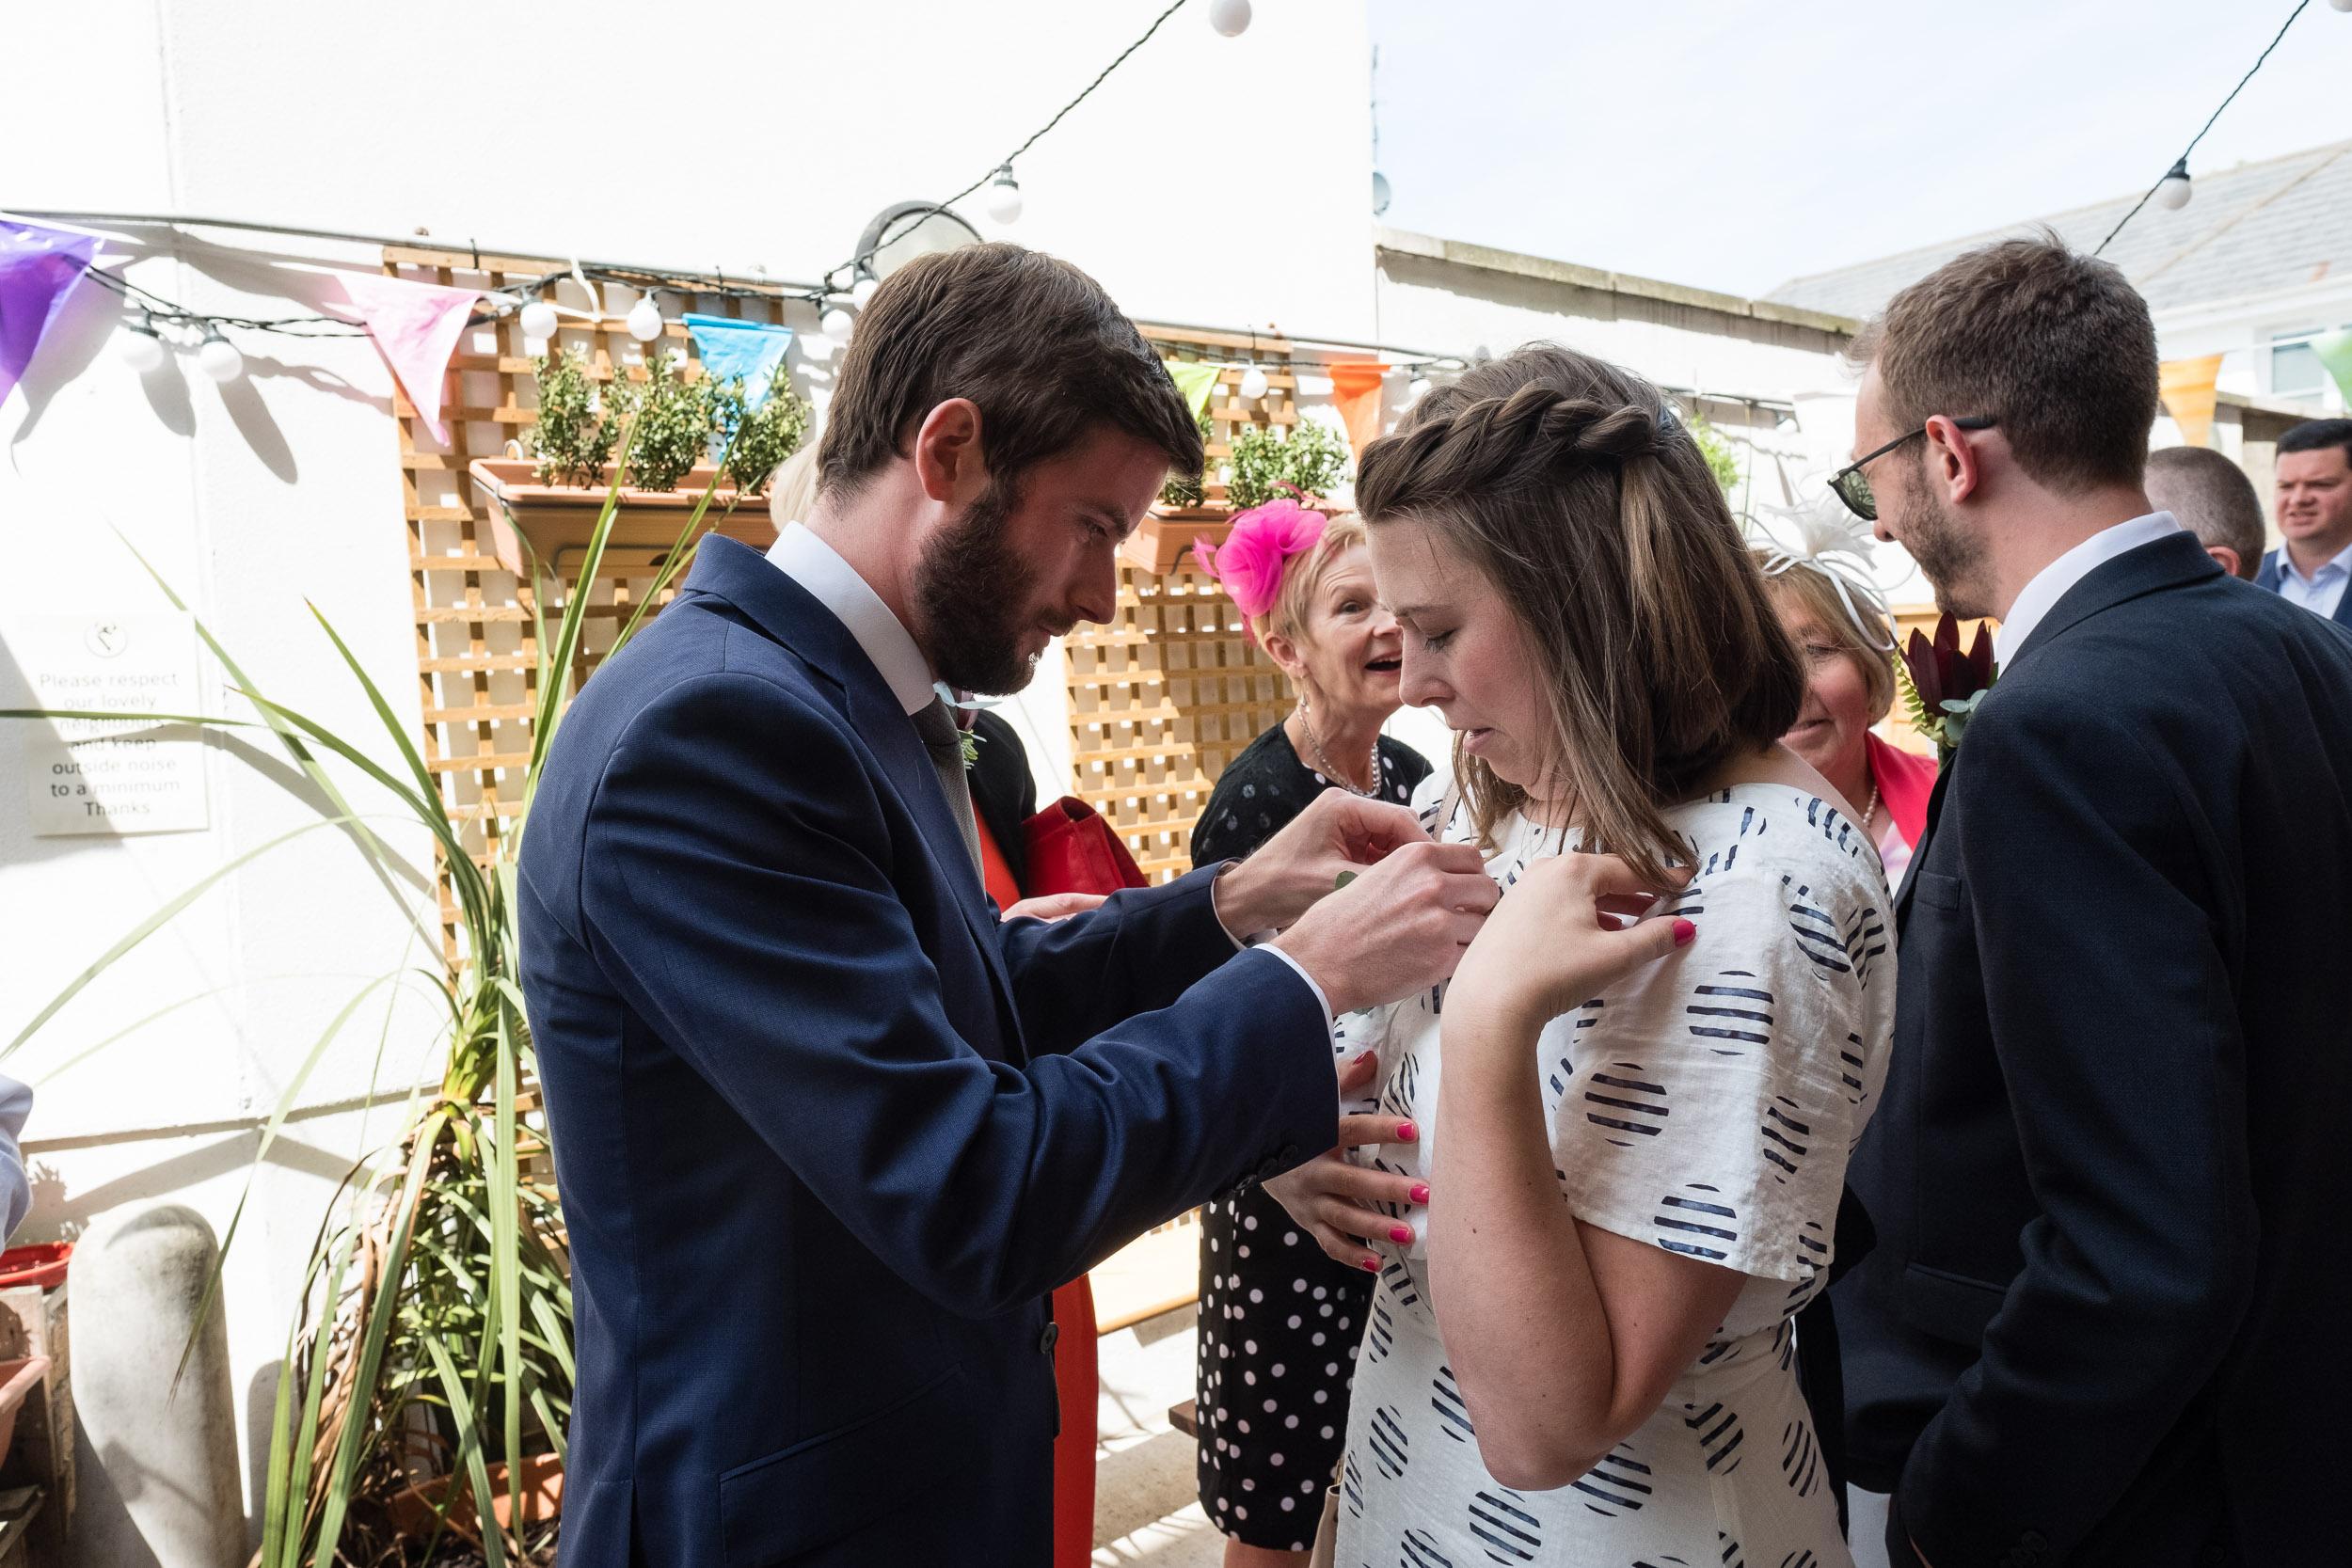 brockwell-lido-brixton-herne-hill-wedding-018.jpg